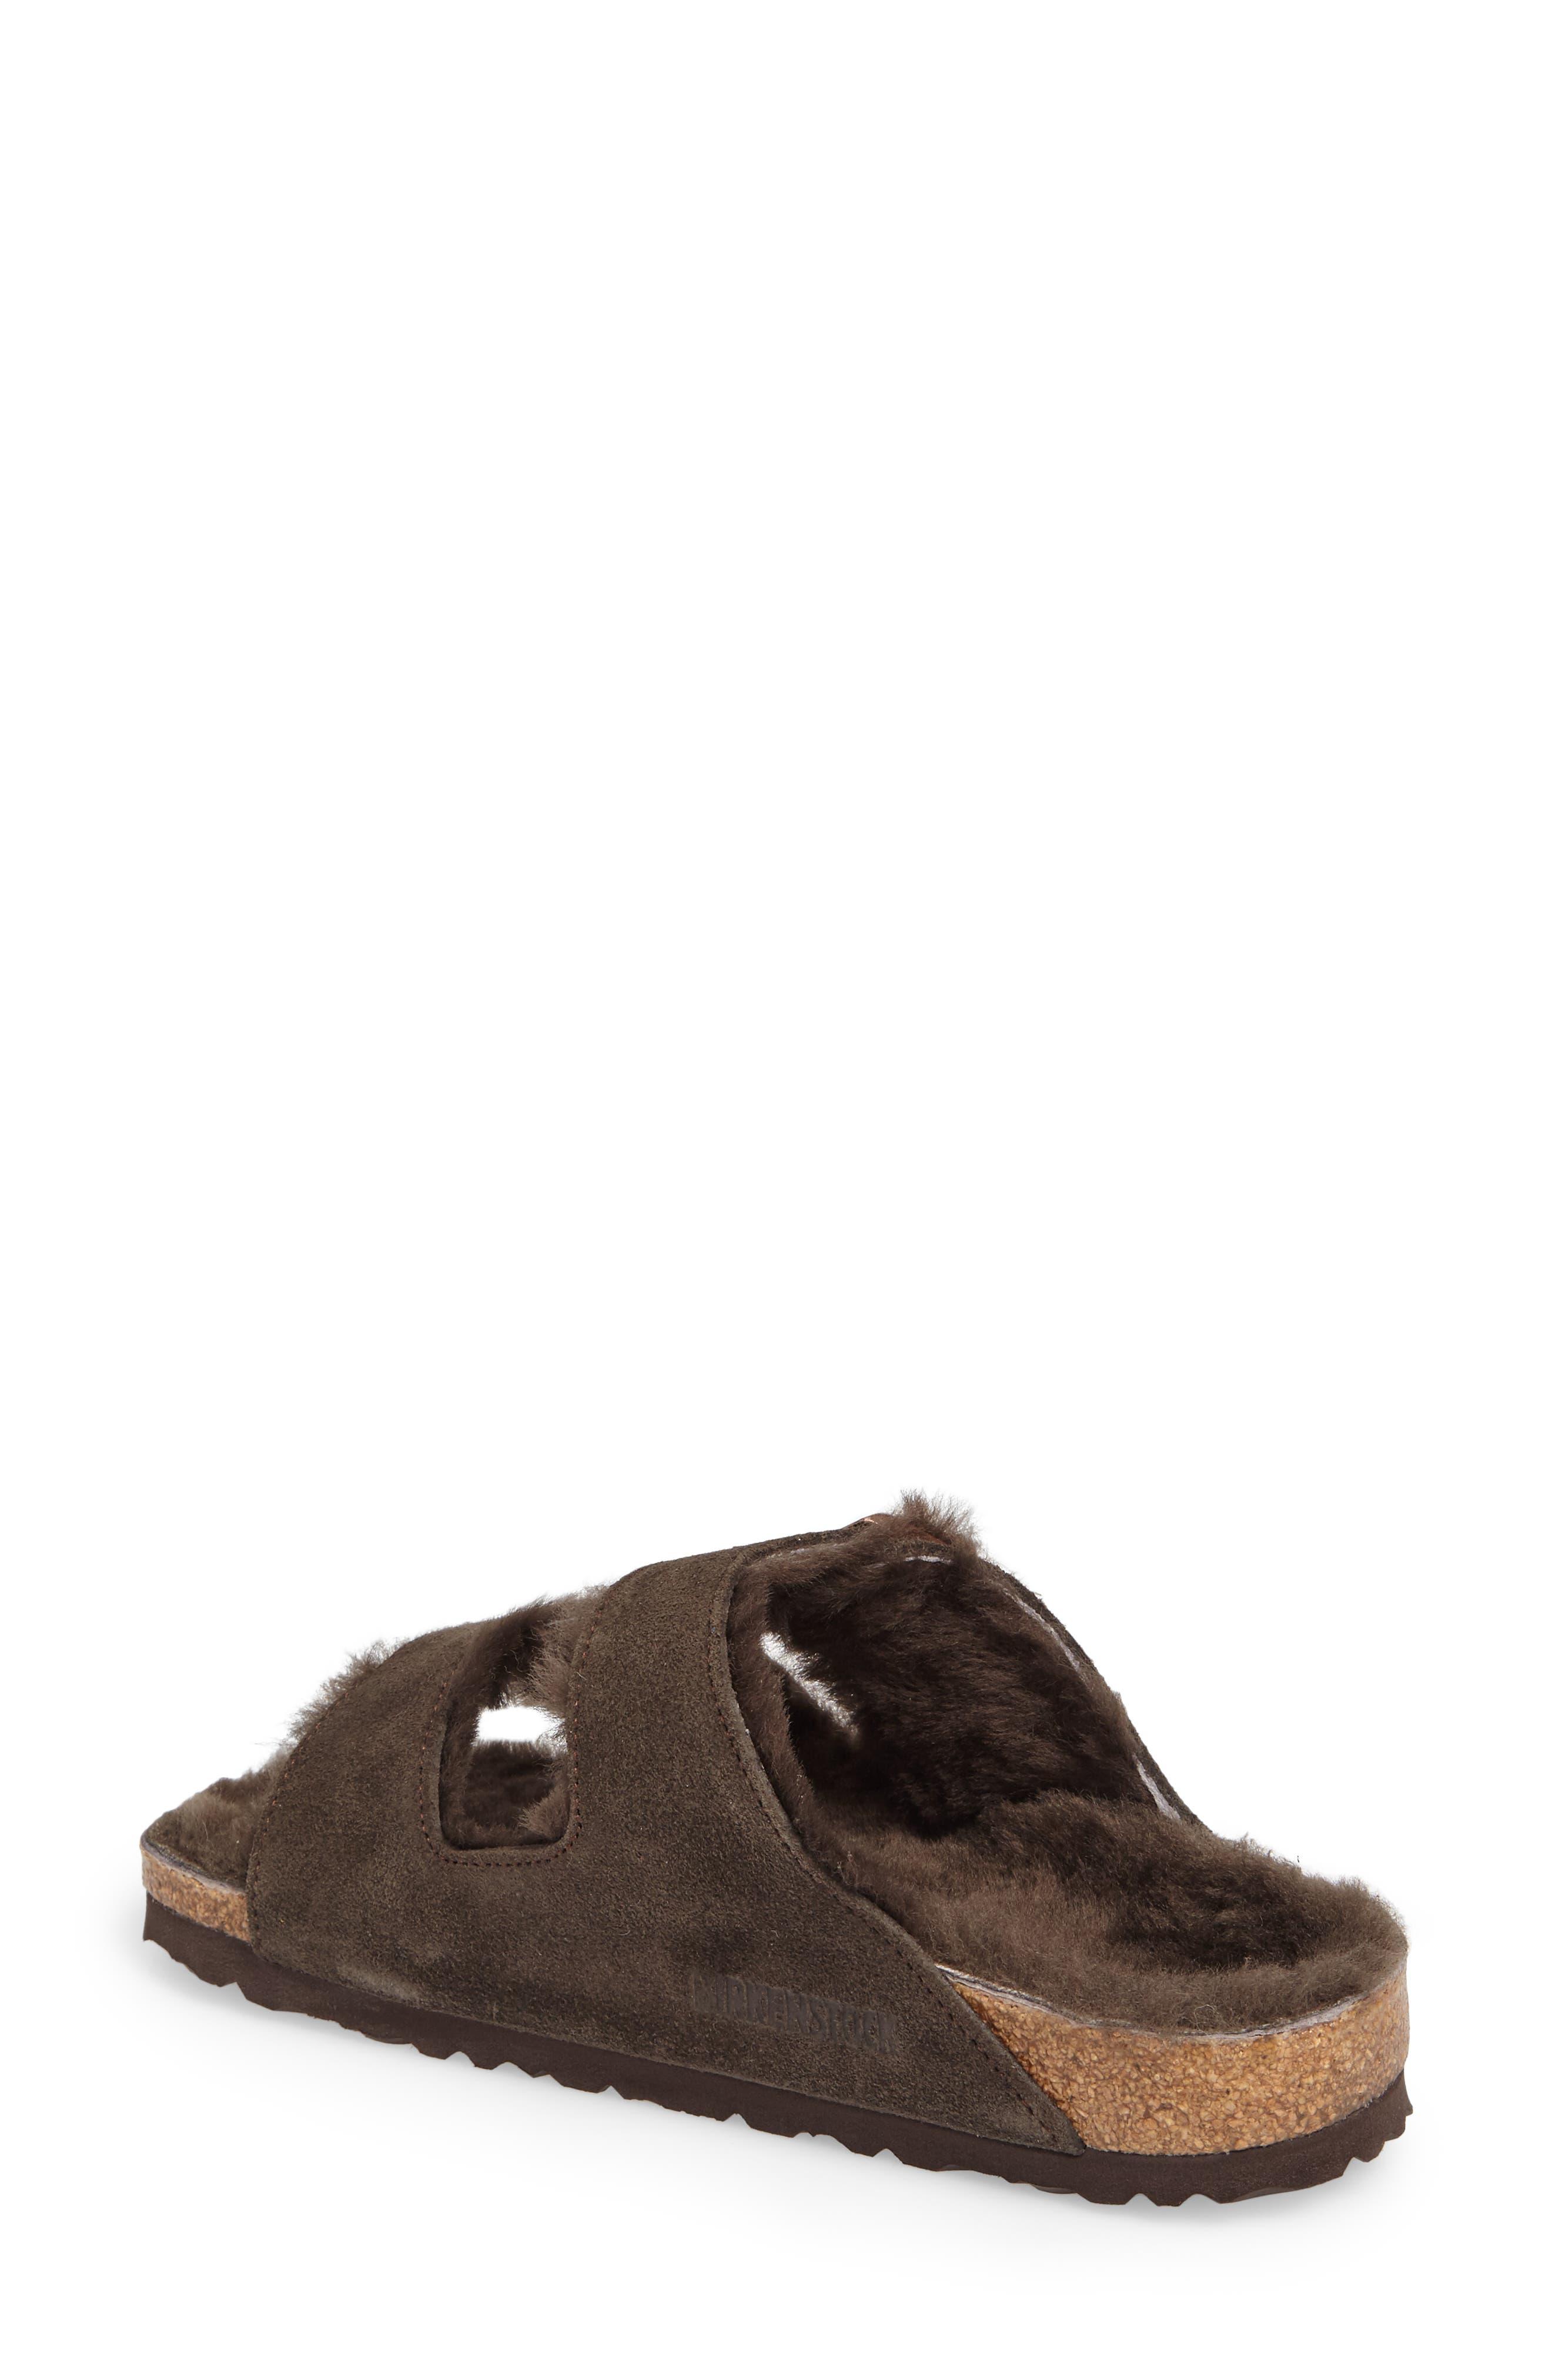 Arizona Genuine Shearling Lined Sandal,                             Alternate thumbnail 2, color,                             200